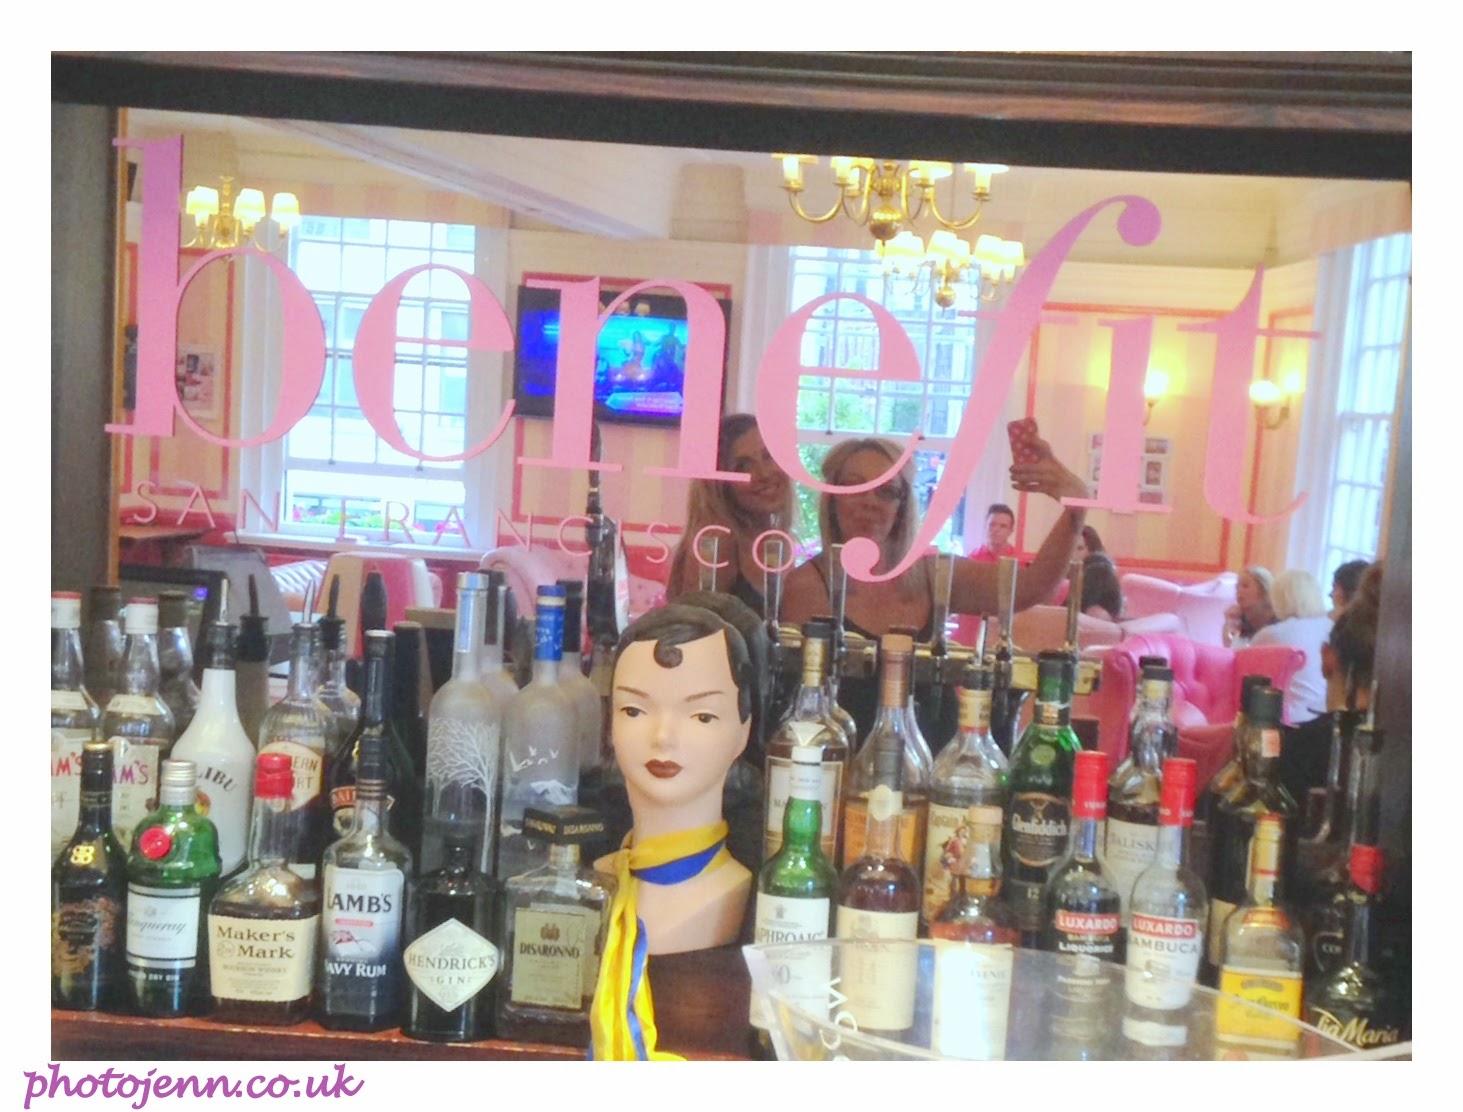 gabbis-head-benefit-cosmetics-pub-mirror